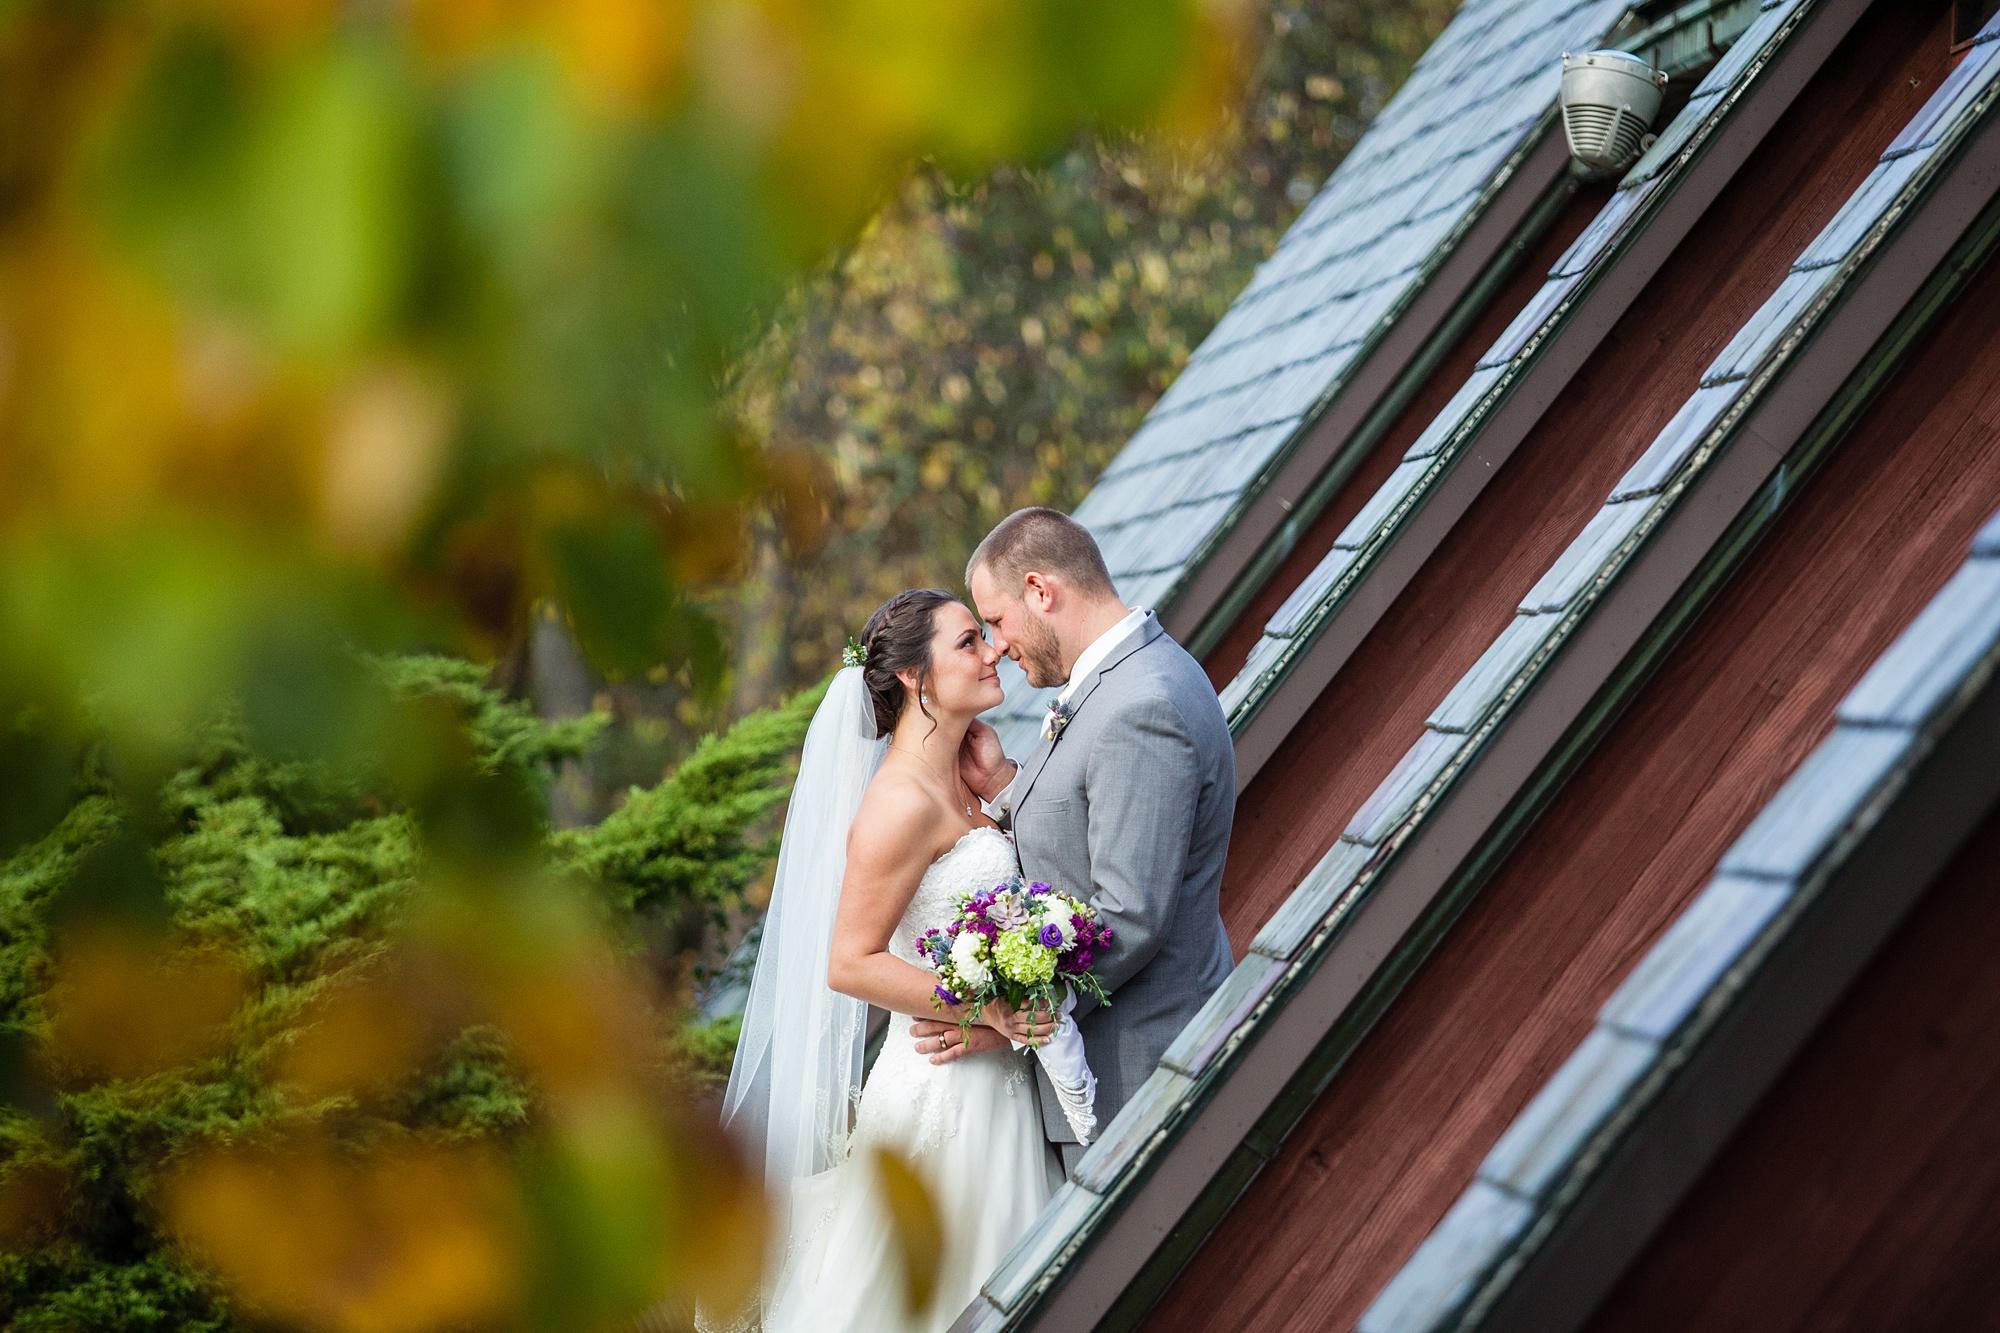 Brandon_Shafer_Photography_Emily_Travis_Kalamazoo_Wedding_Photography_0031.jpg